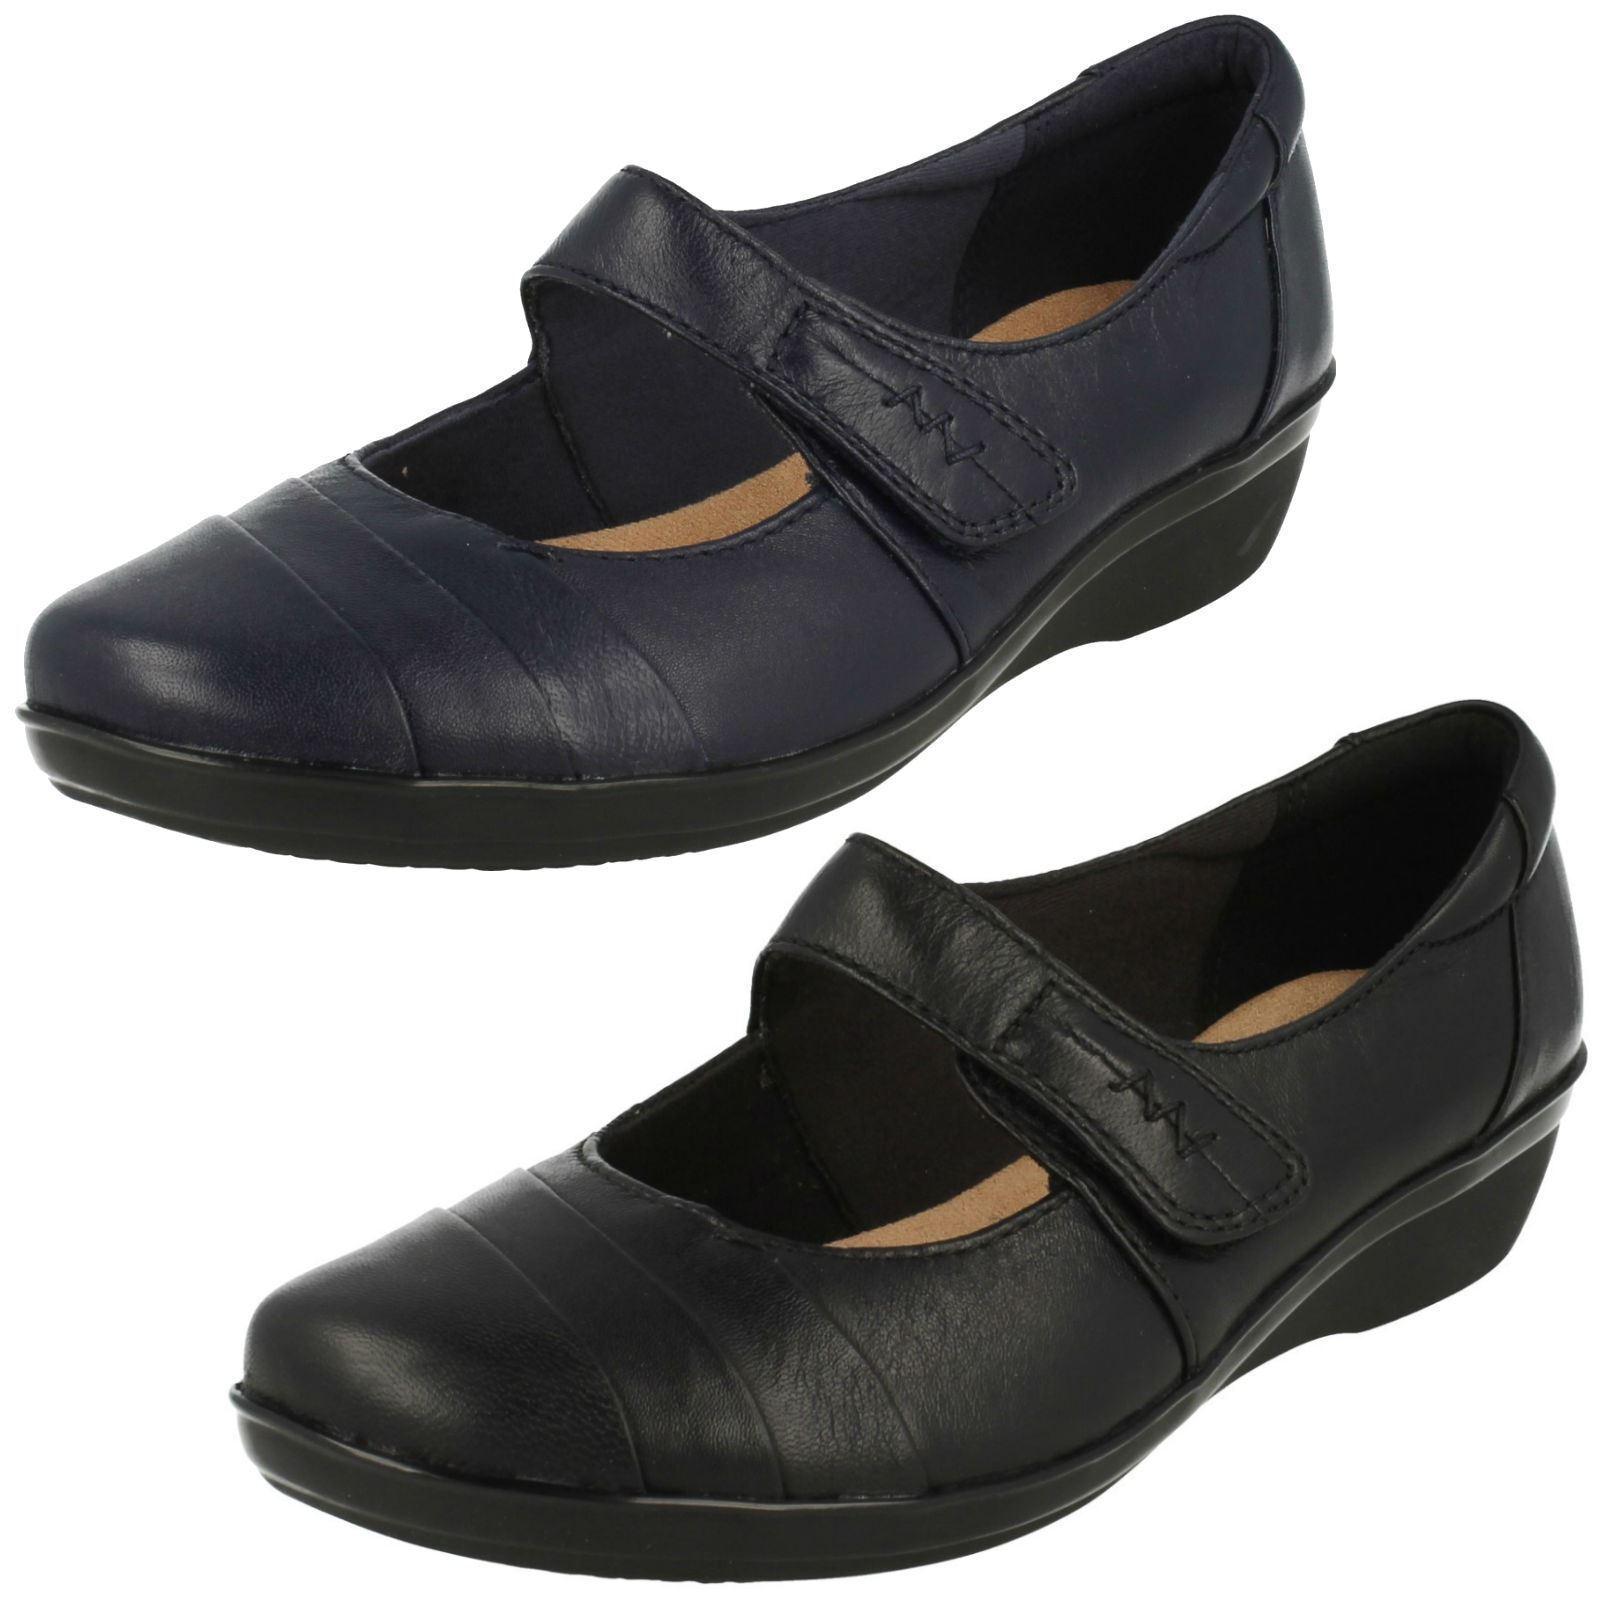 Clarks 'everlay Kennon' Damen Klettverschluss Riemen Leder Keil Bbsatz Schuhe